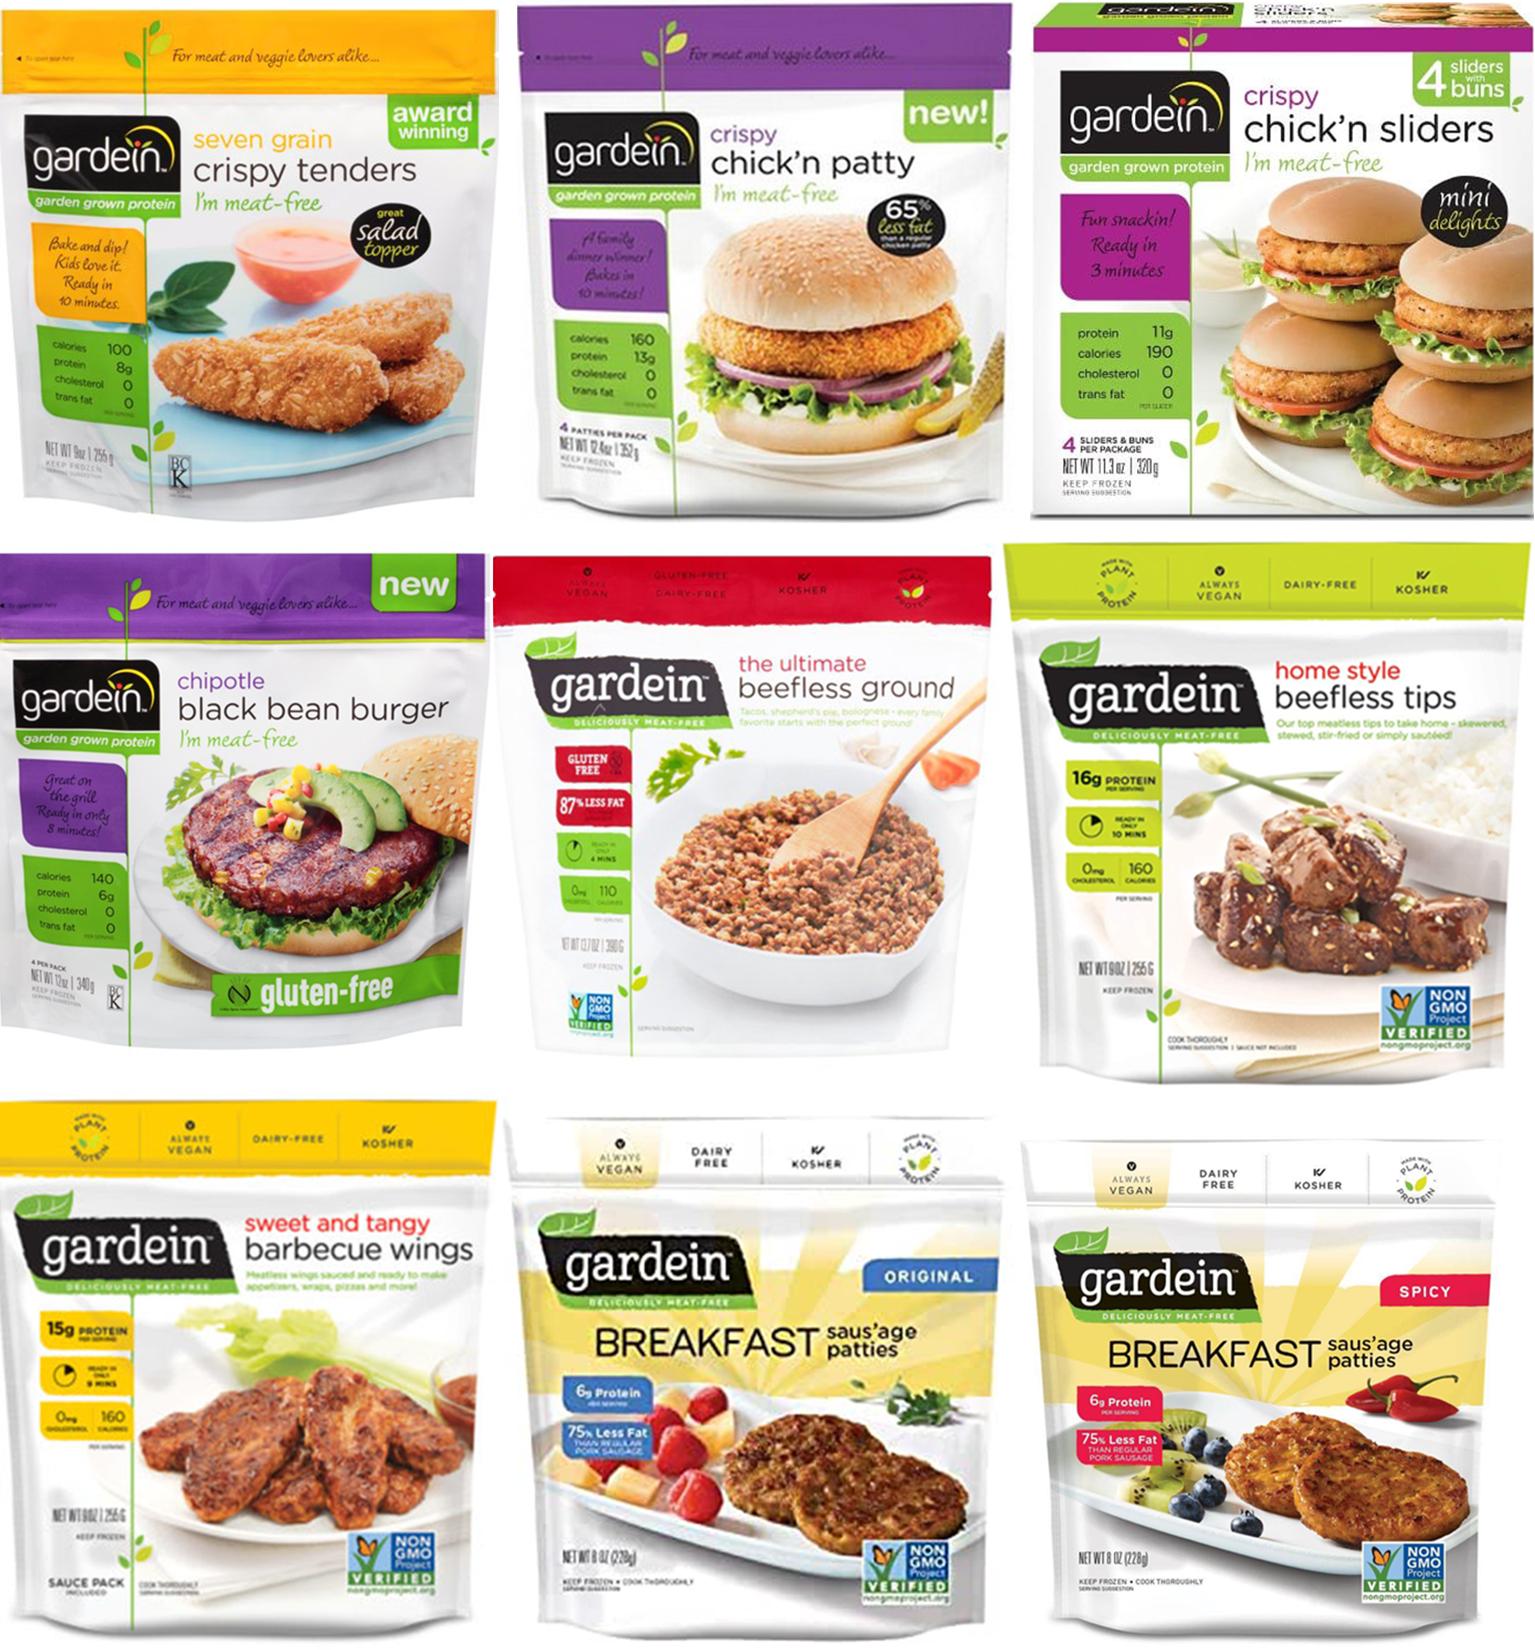 AterImber.com - The Veg Life - Vegan Tips - Store Crawl: Metro Online Edition - Gardein Collage - vegan, vegan food, shopping, vegan food reviewer, vegan food blogger